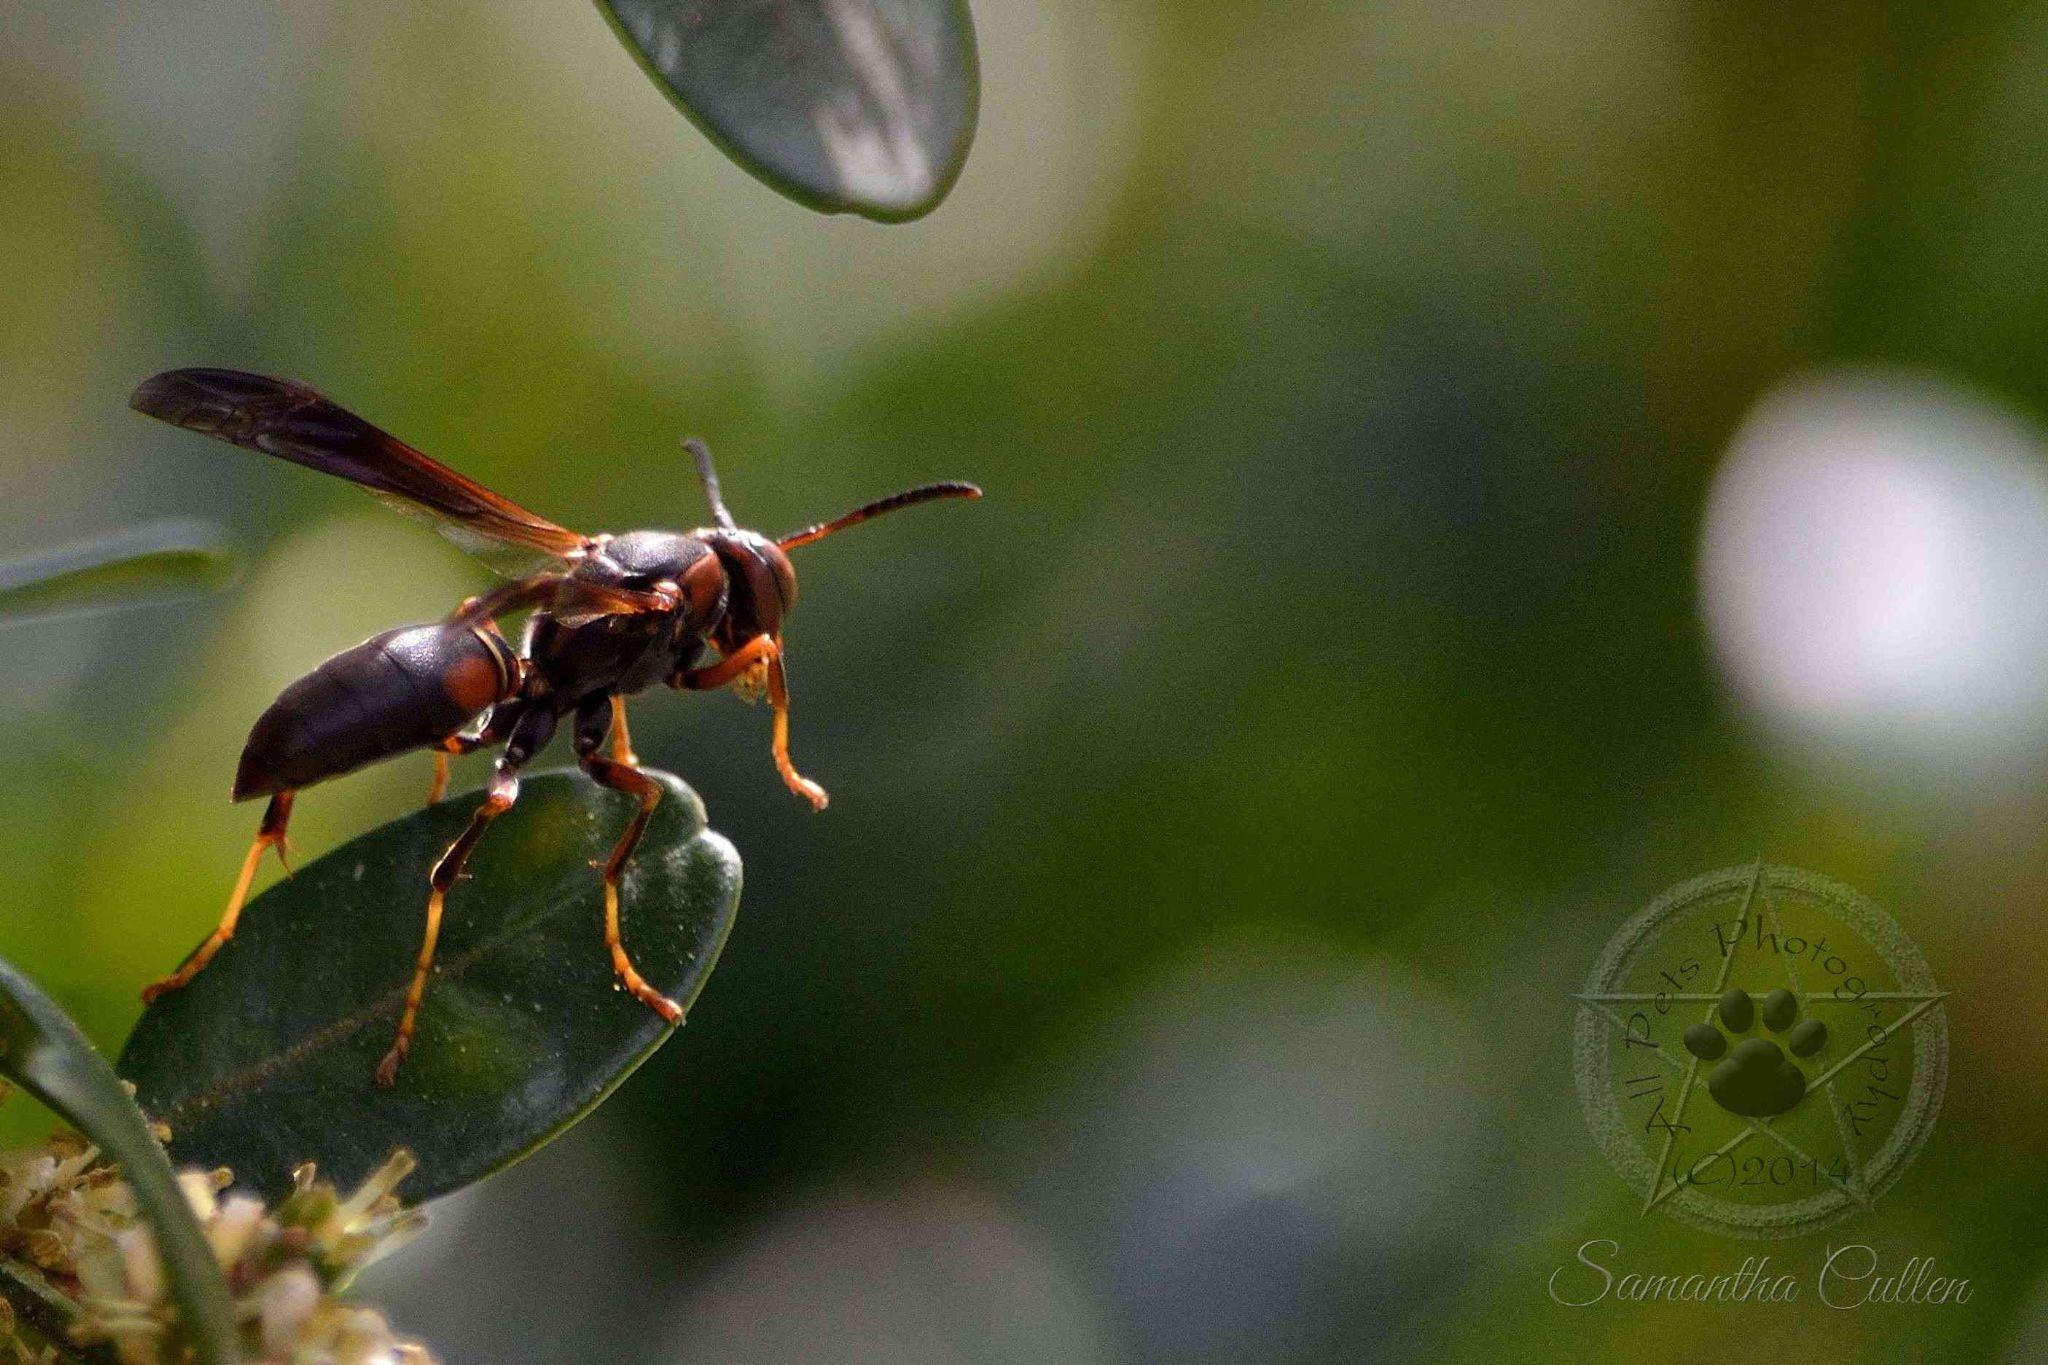 Wasp by Samantha Cullen